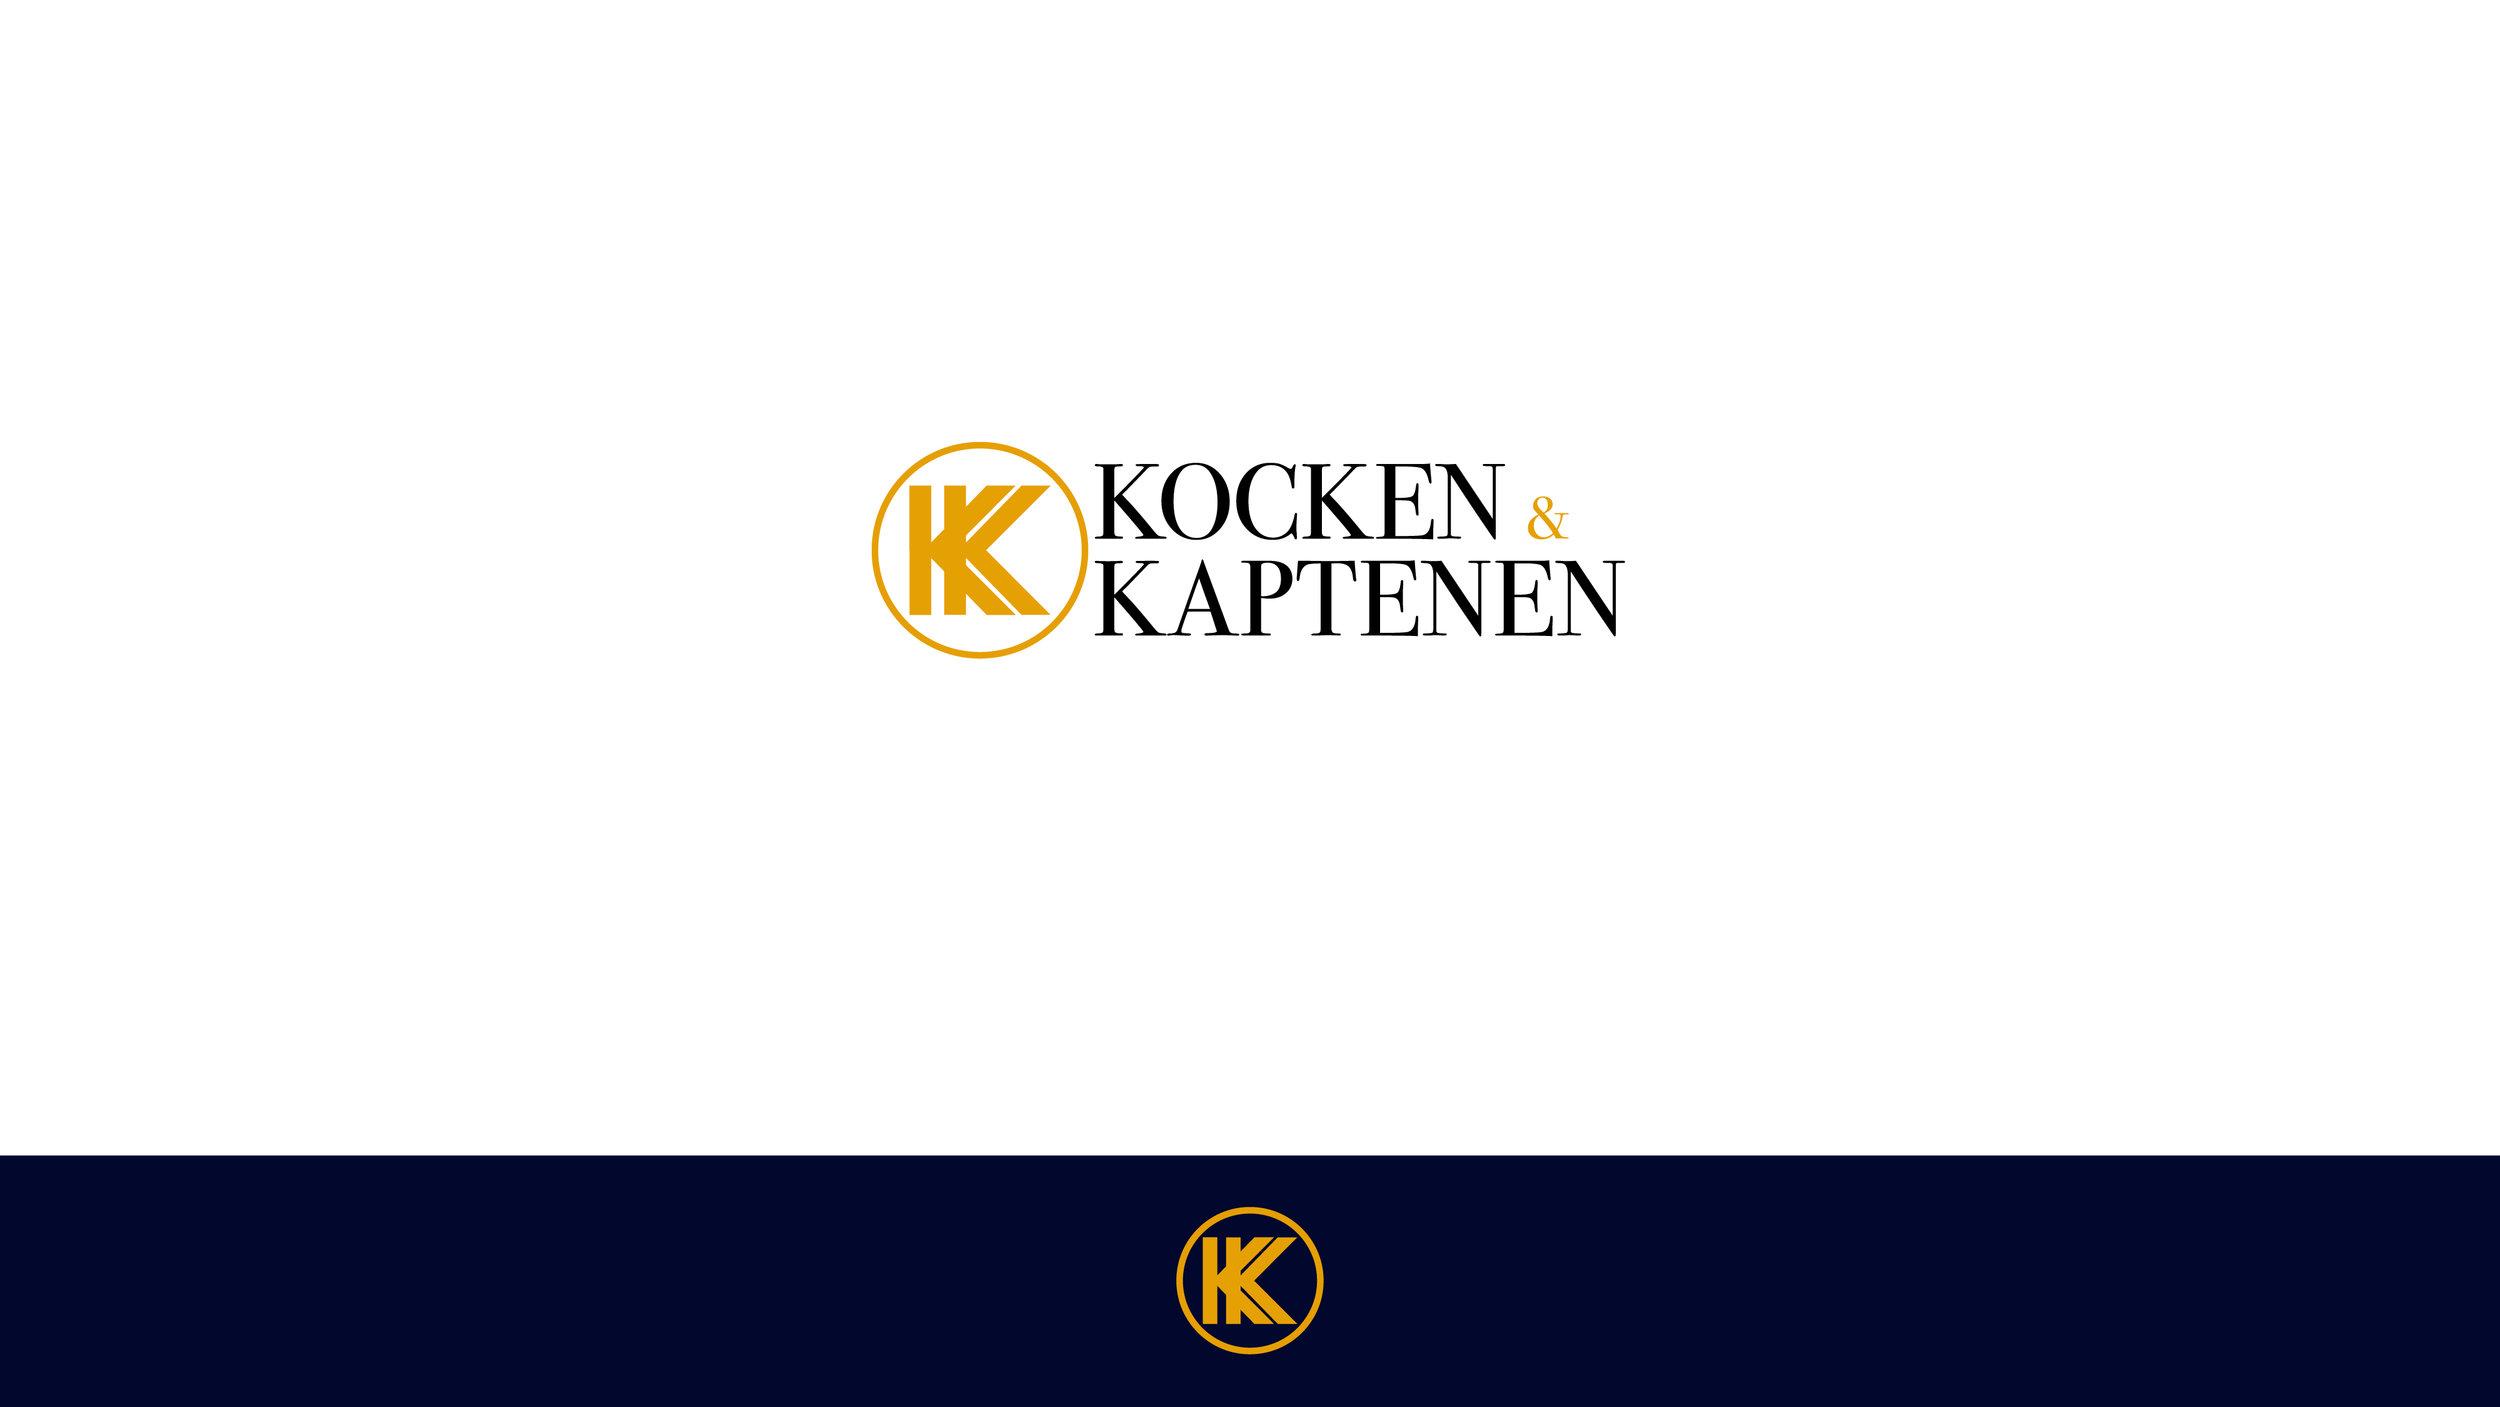 Kocken & Kaptenen: Grafisk identitet